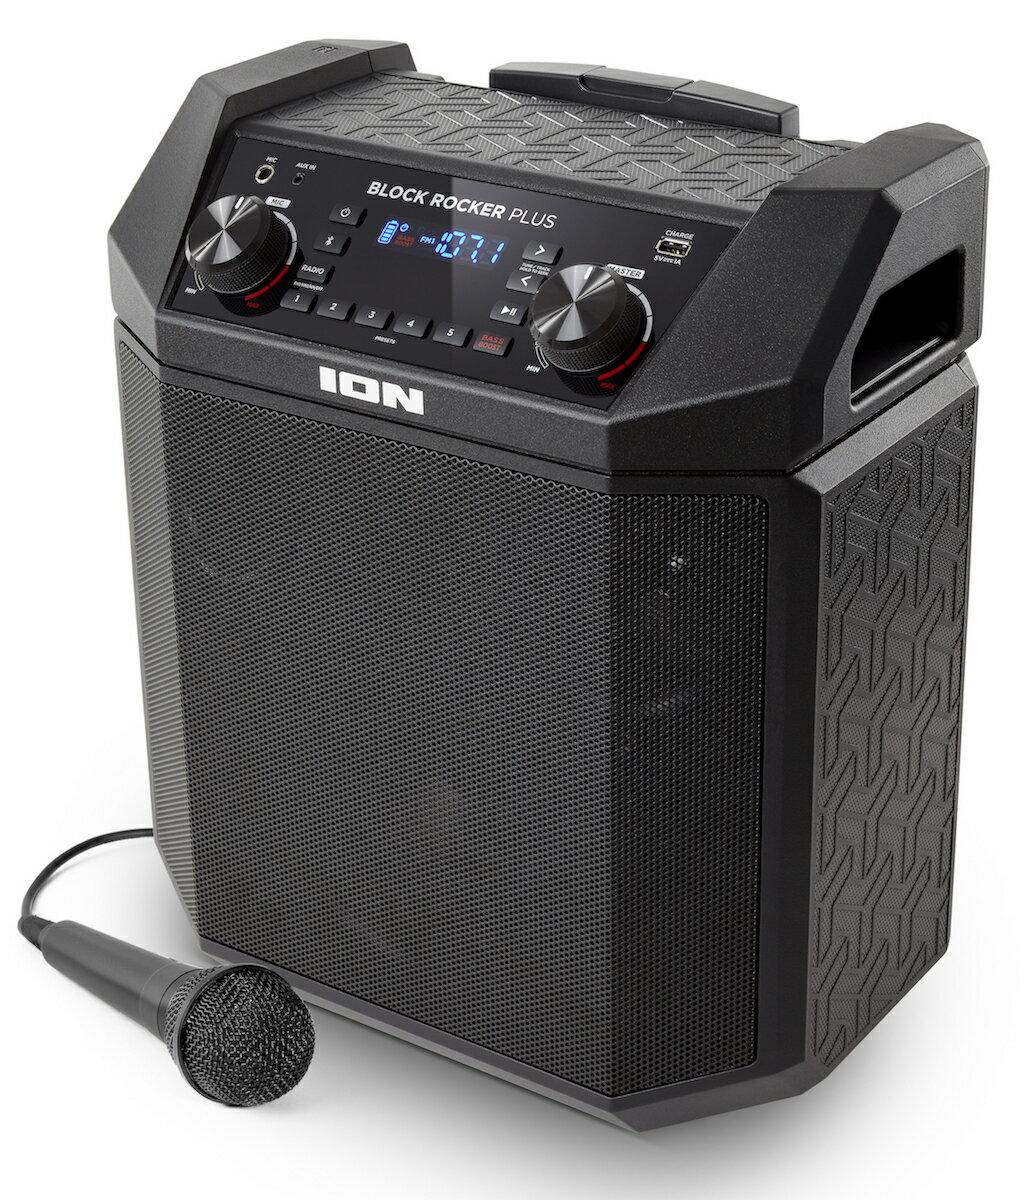 ION Audio Bluetooth対応 ポータブルPAスピーカー 低音 ブースト 機能搭載 50時間バッテリー 100W マイク 付き Block Rocker Plus